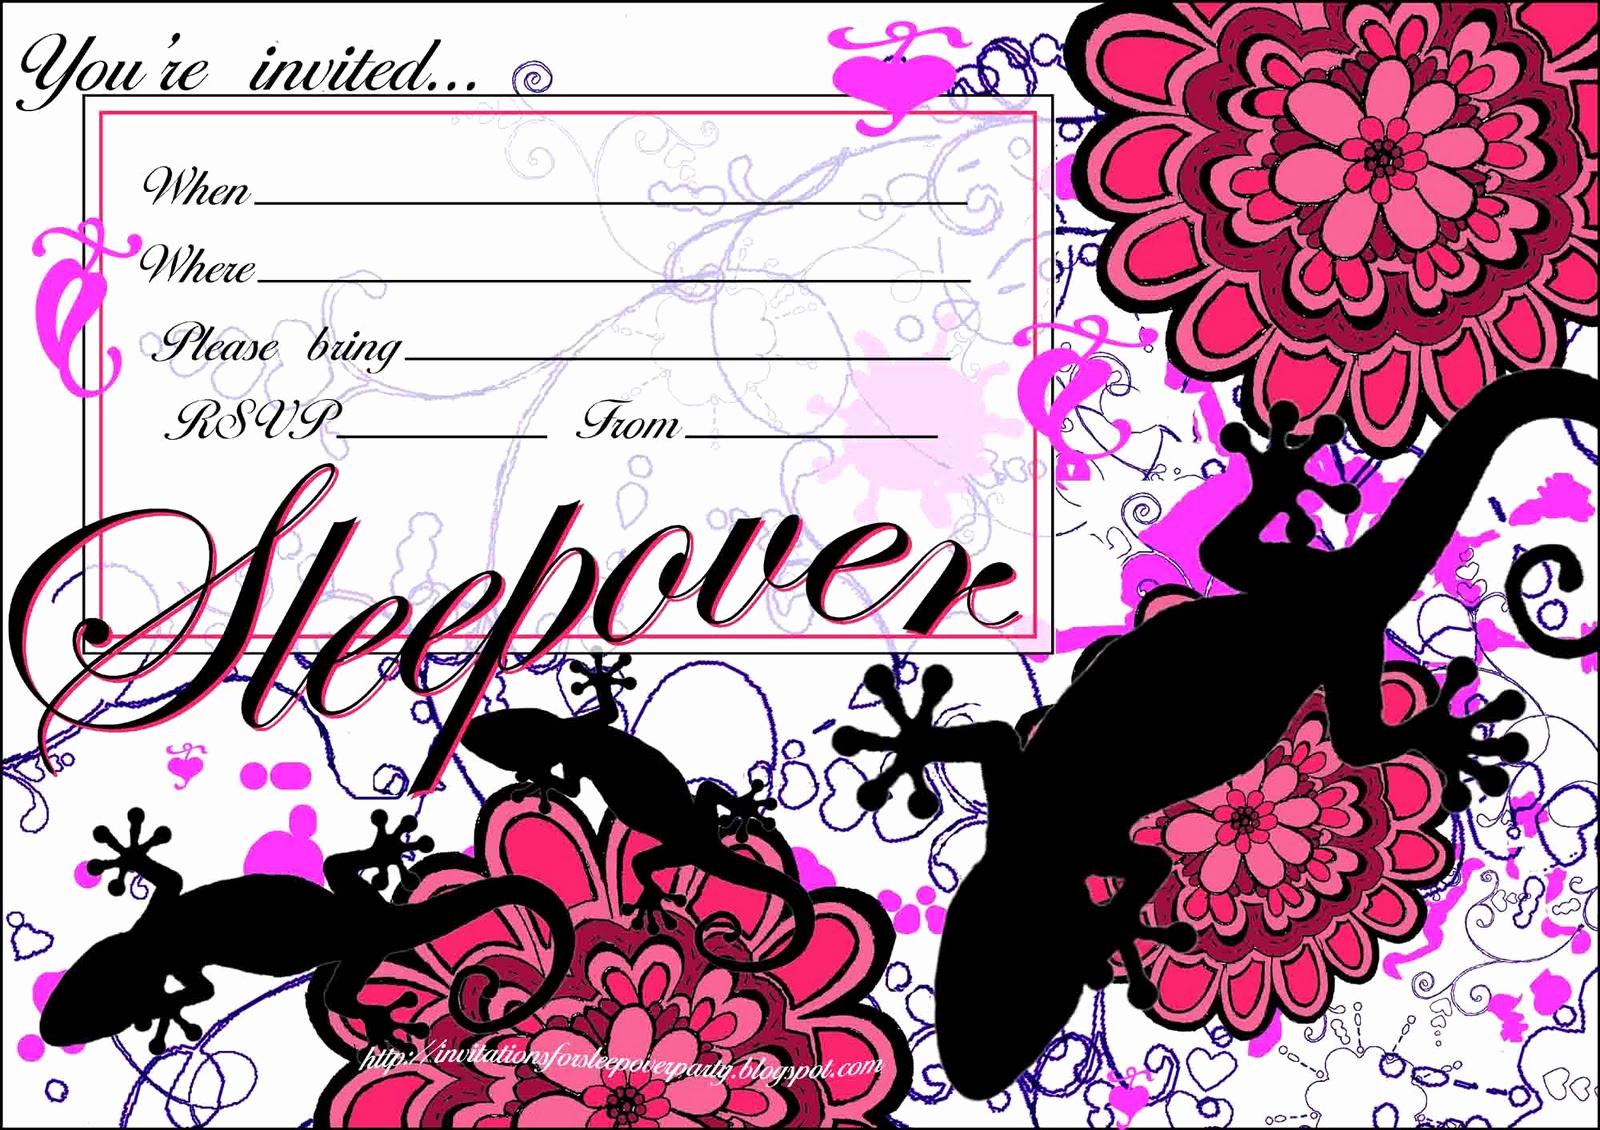 Free Sleepover Invitation Template Inspirational Invitations for Sleepover Party